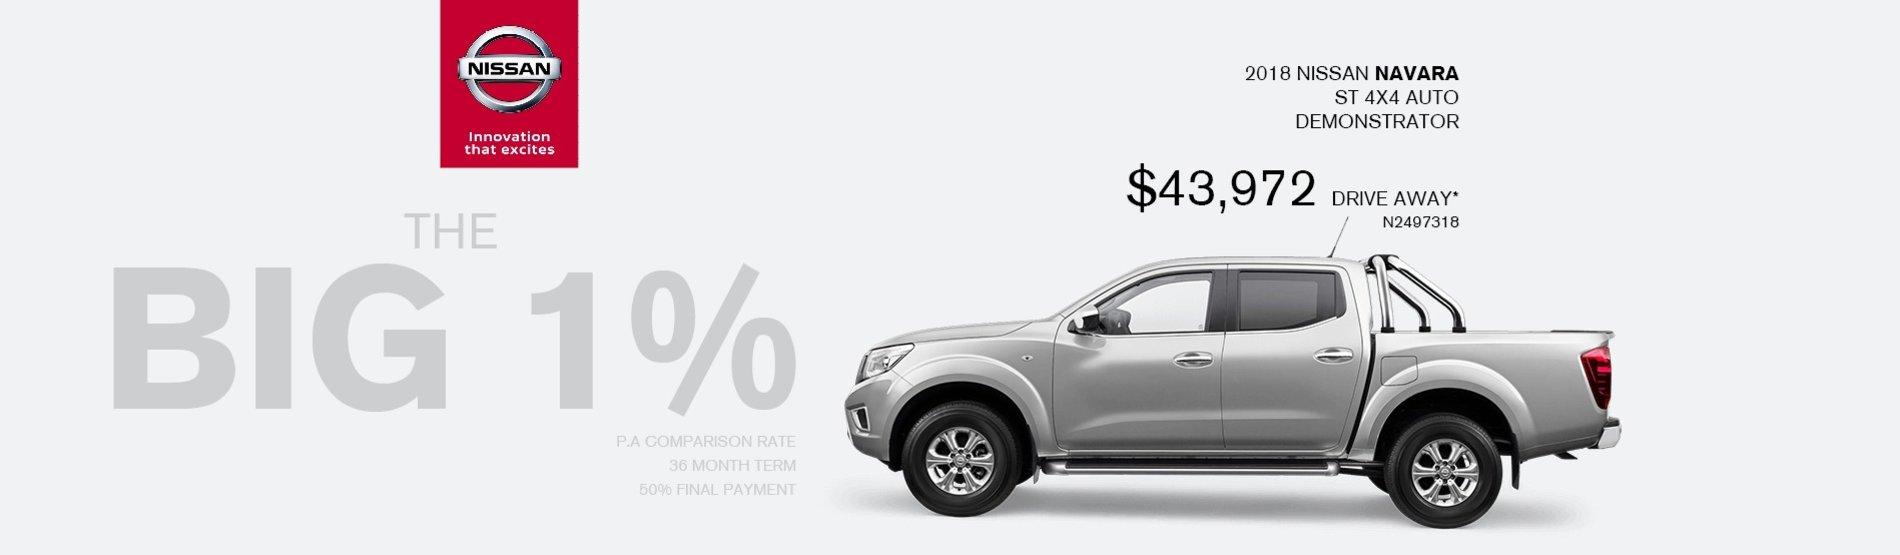 Maitland Nissan BIG 1%